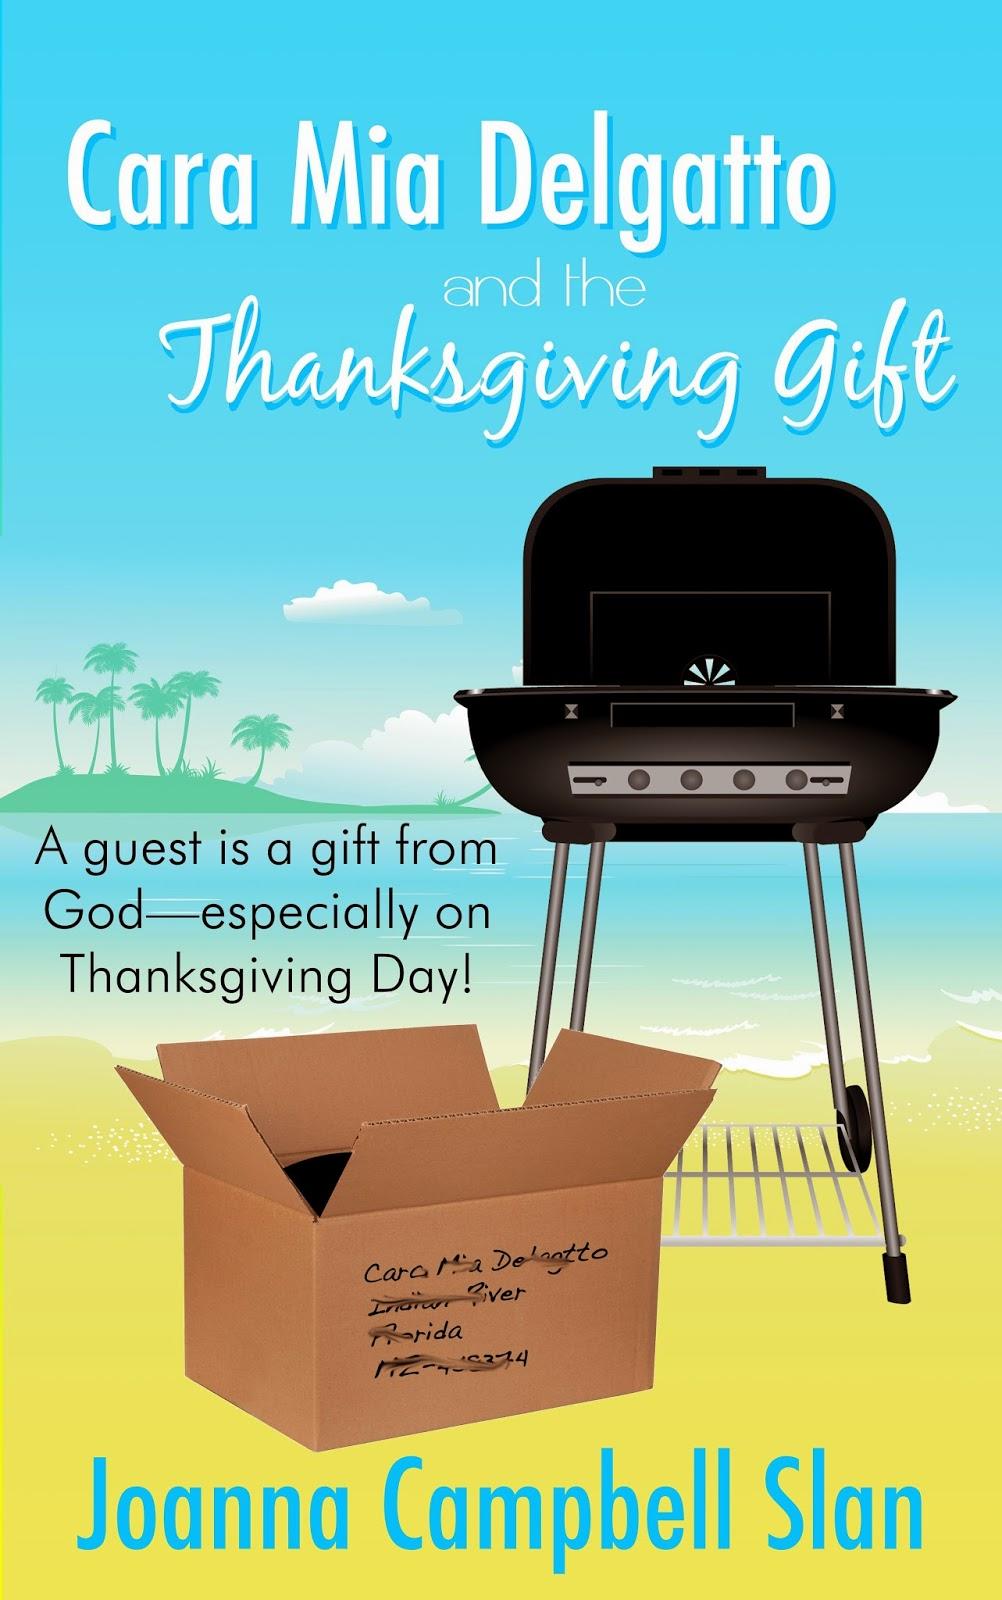 Cara Mia Delgatto and the Thanksgiving Gift